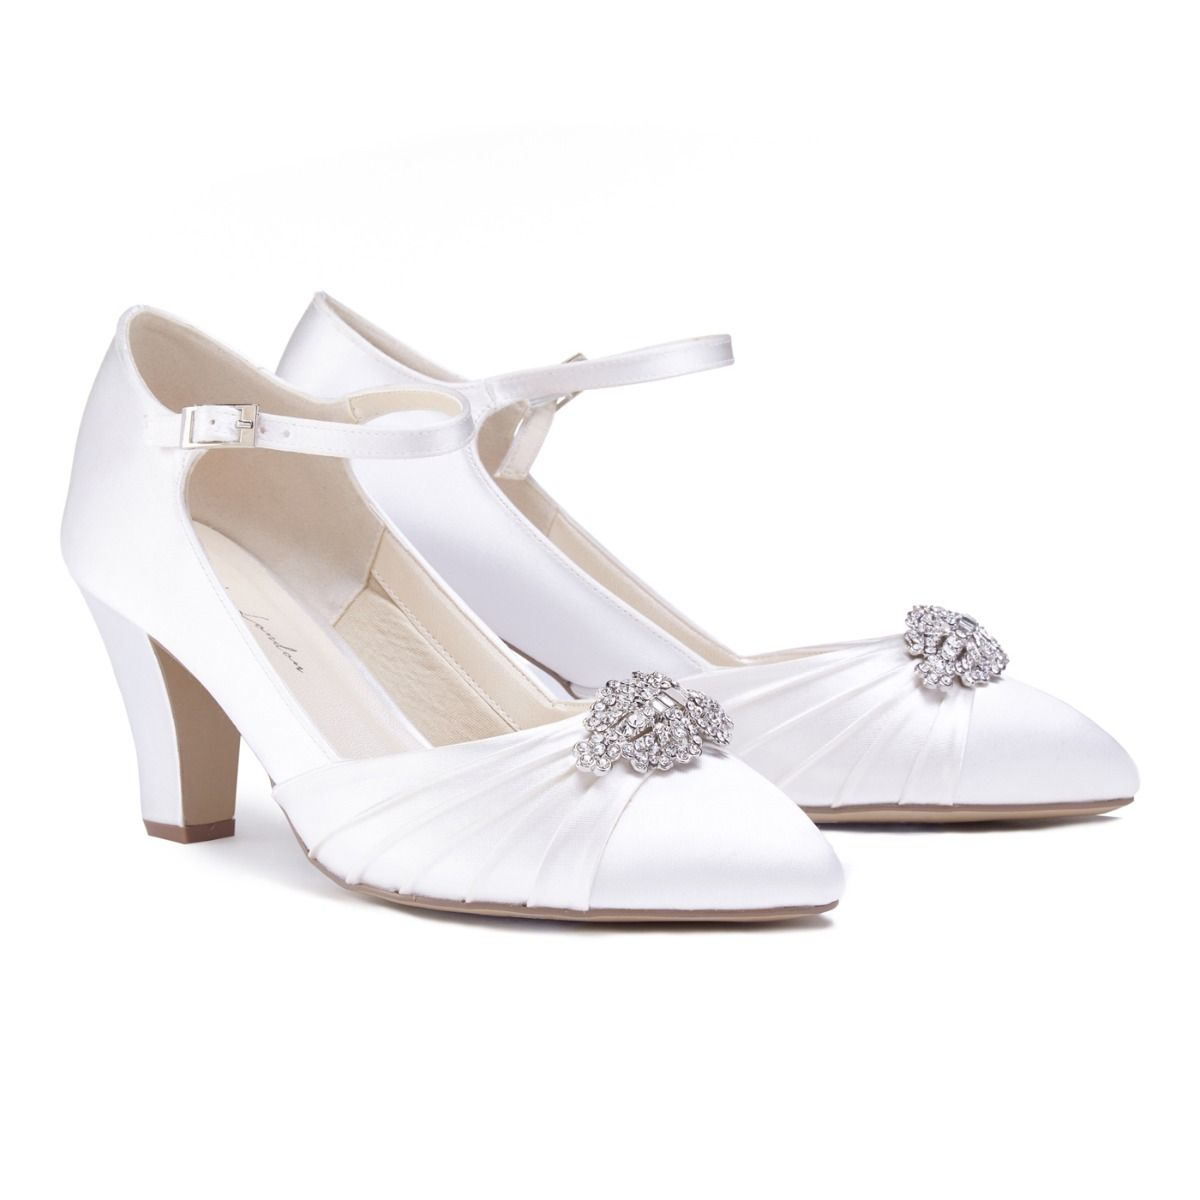 7ea7192a827 ... Heel Small Wedge Wedding Shoes Cute Low Adrianna ...